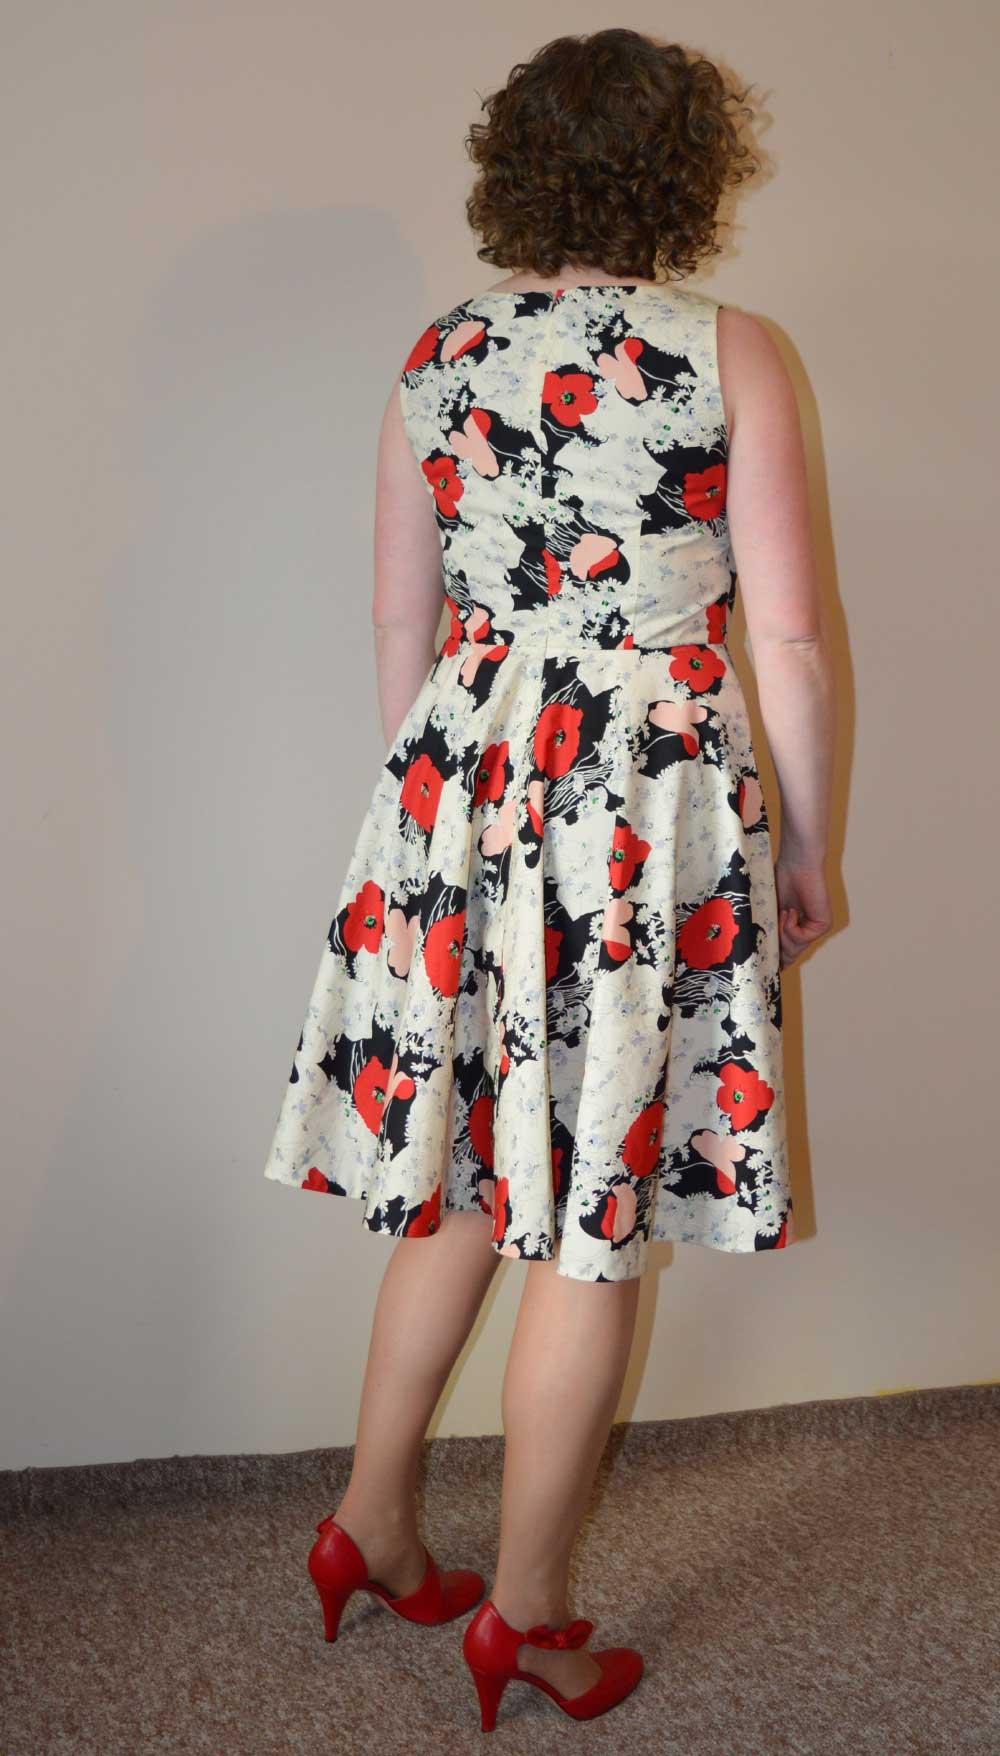 Vogue V9149 Swishy Party Dress | Red Poppy Cotton Poplin | Back | Holm Sown